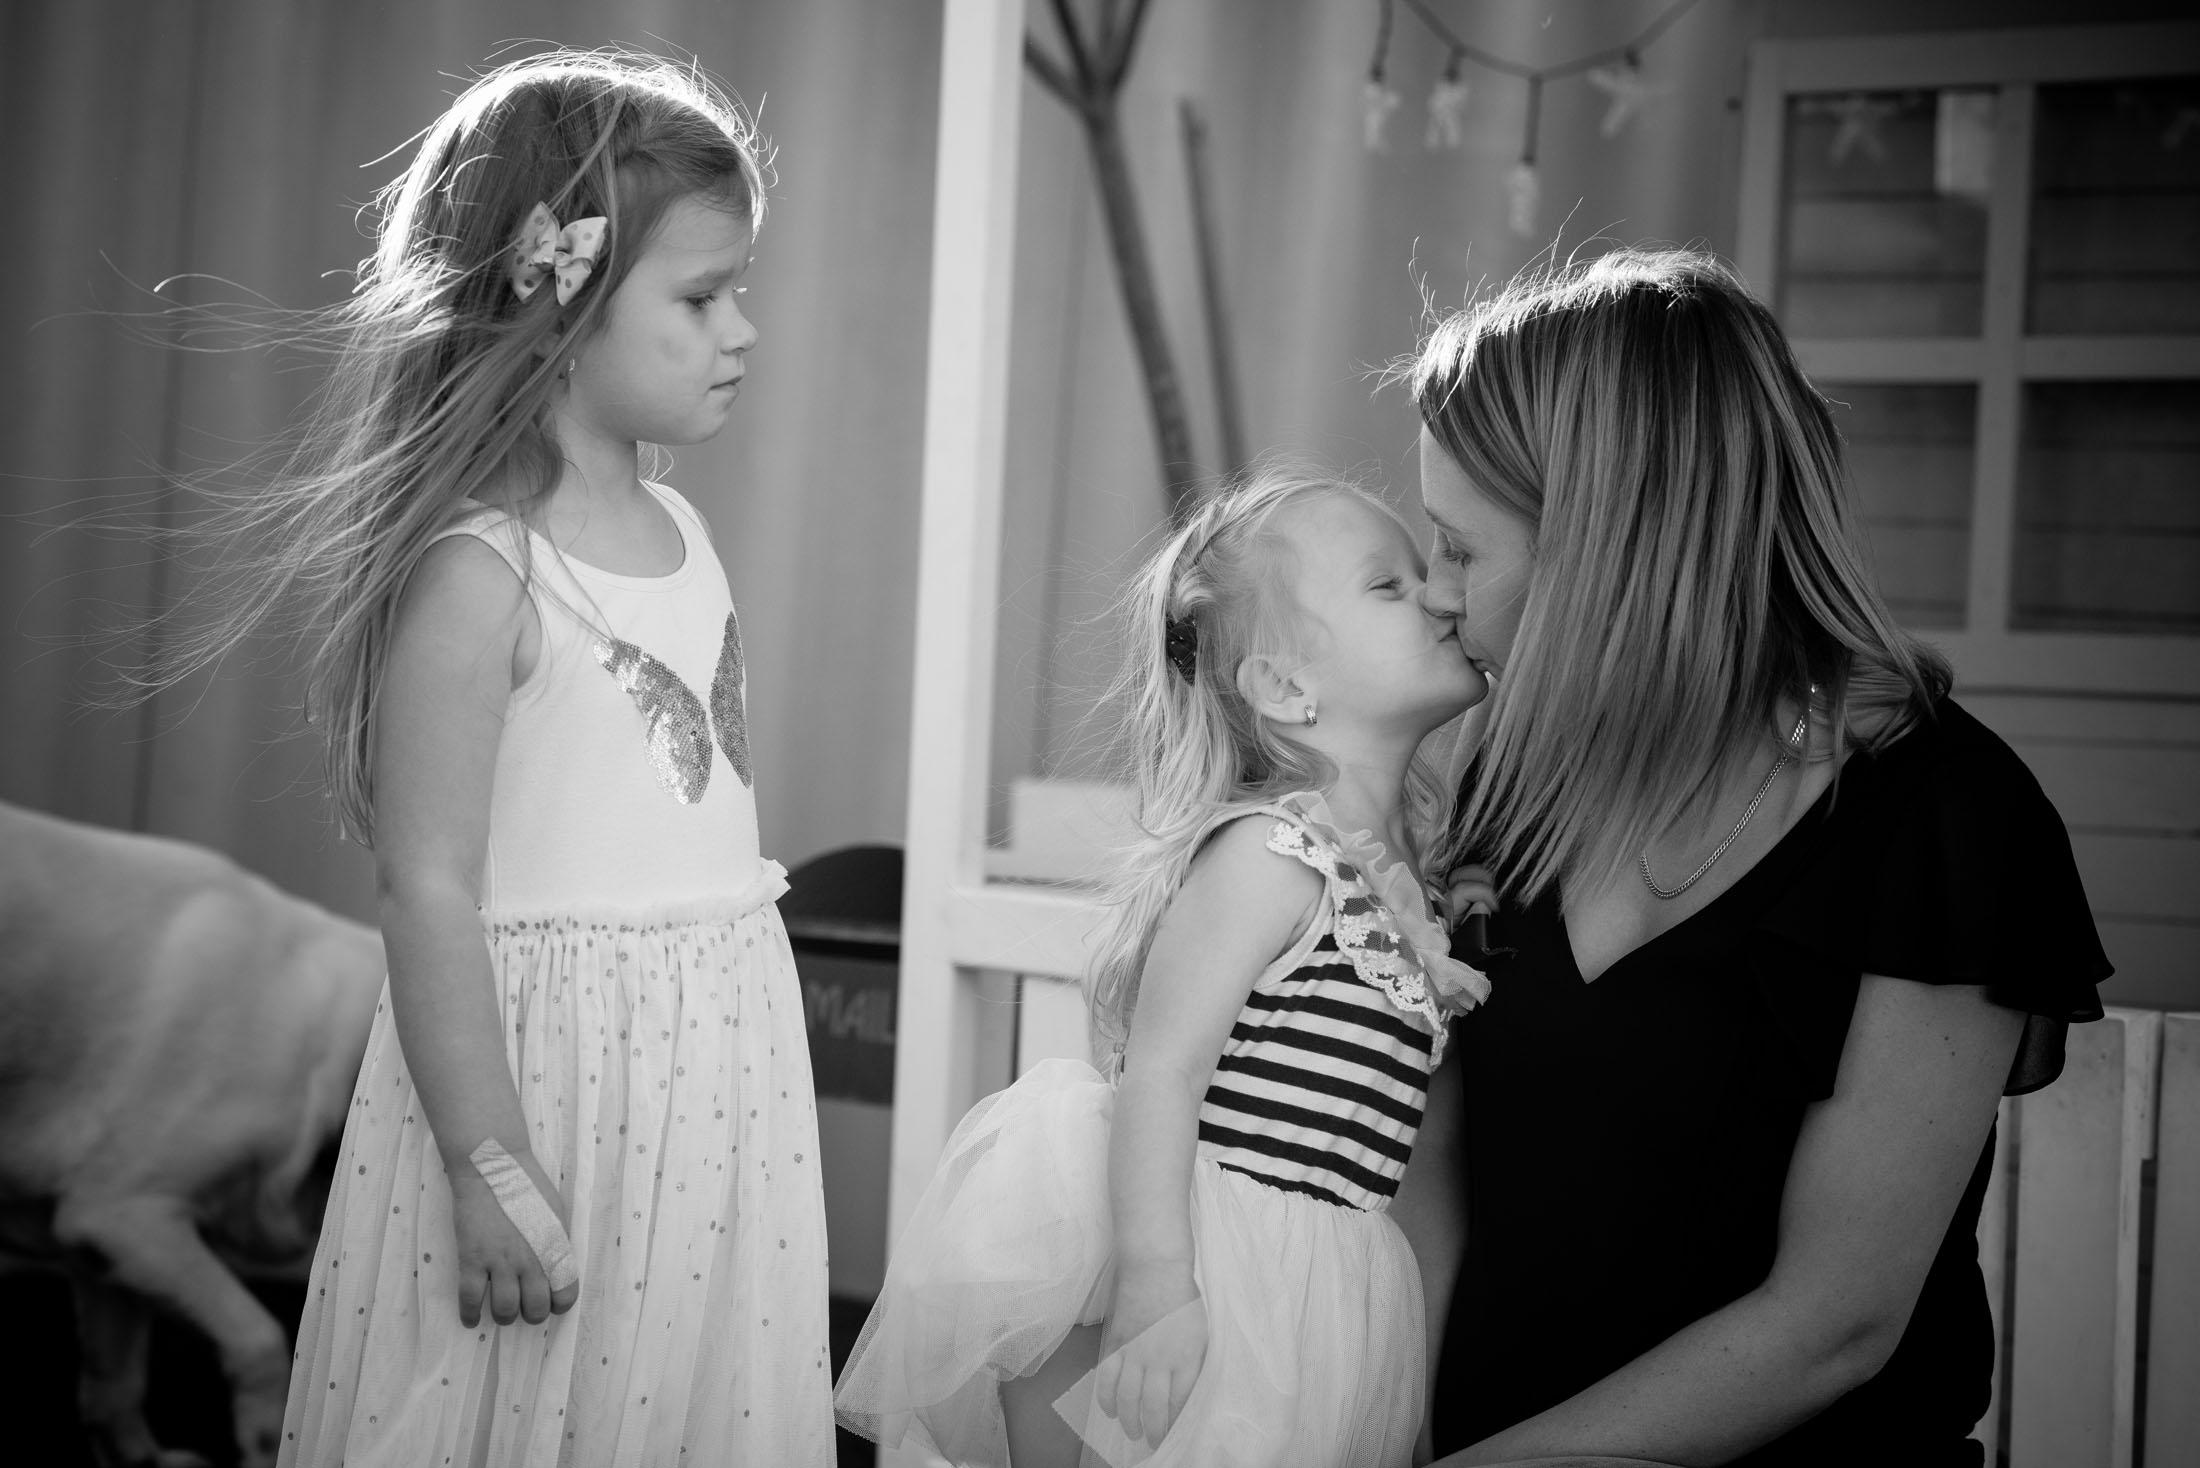 Sach_Family-Photography-unposed13.JPG